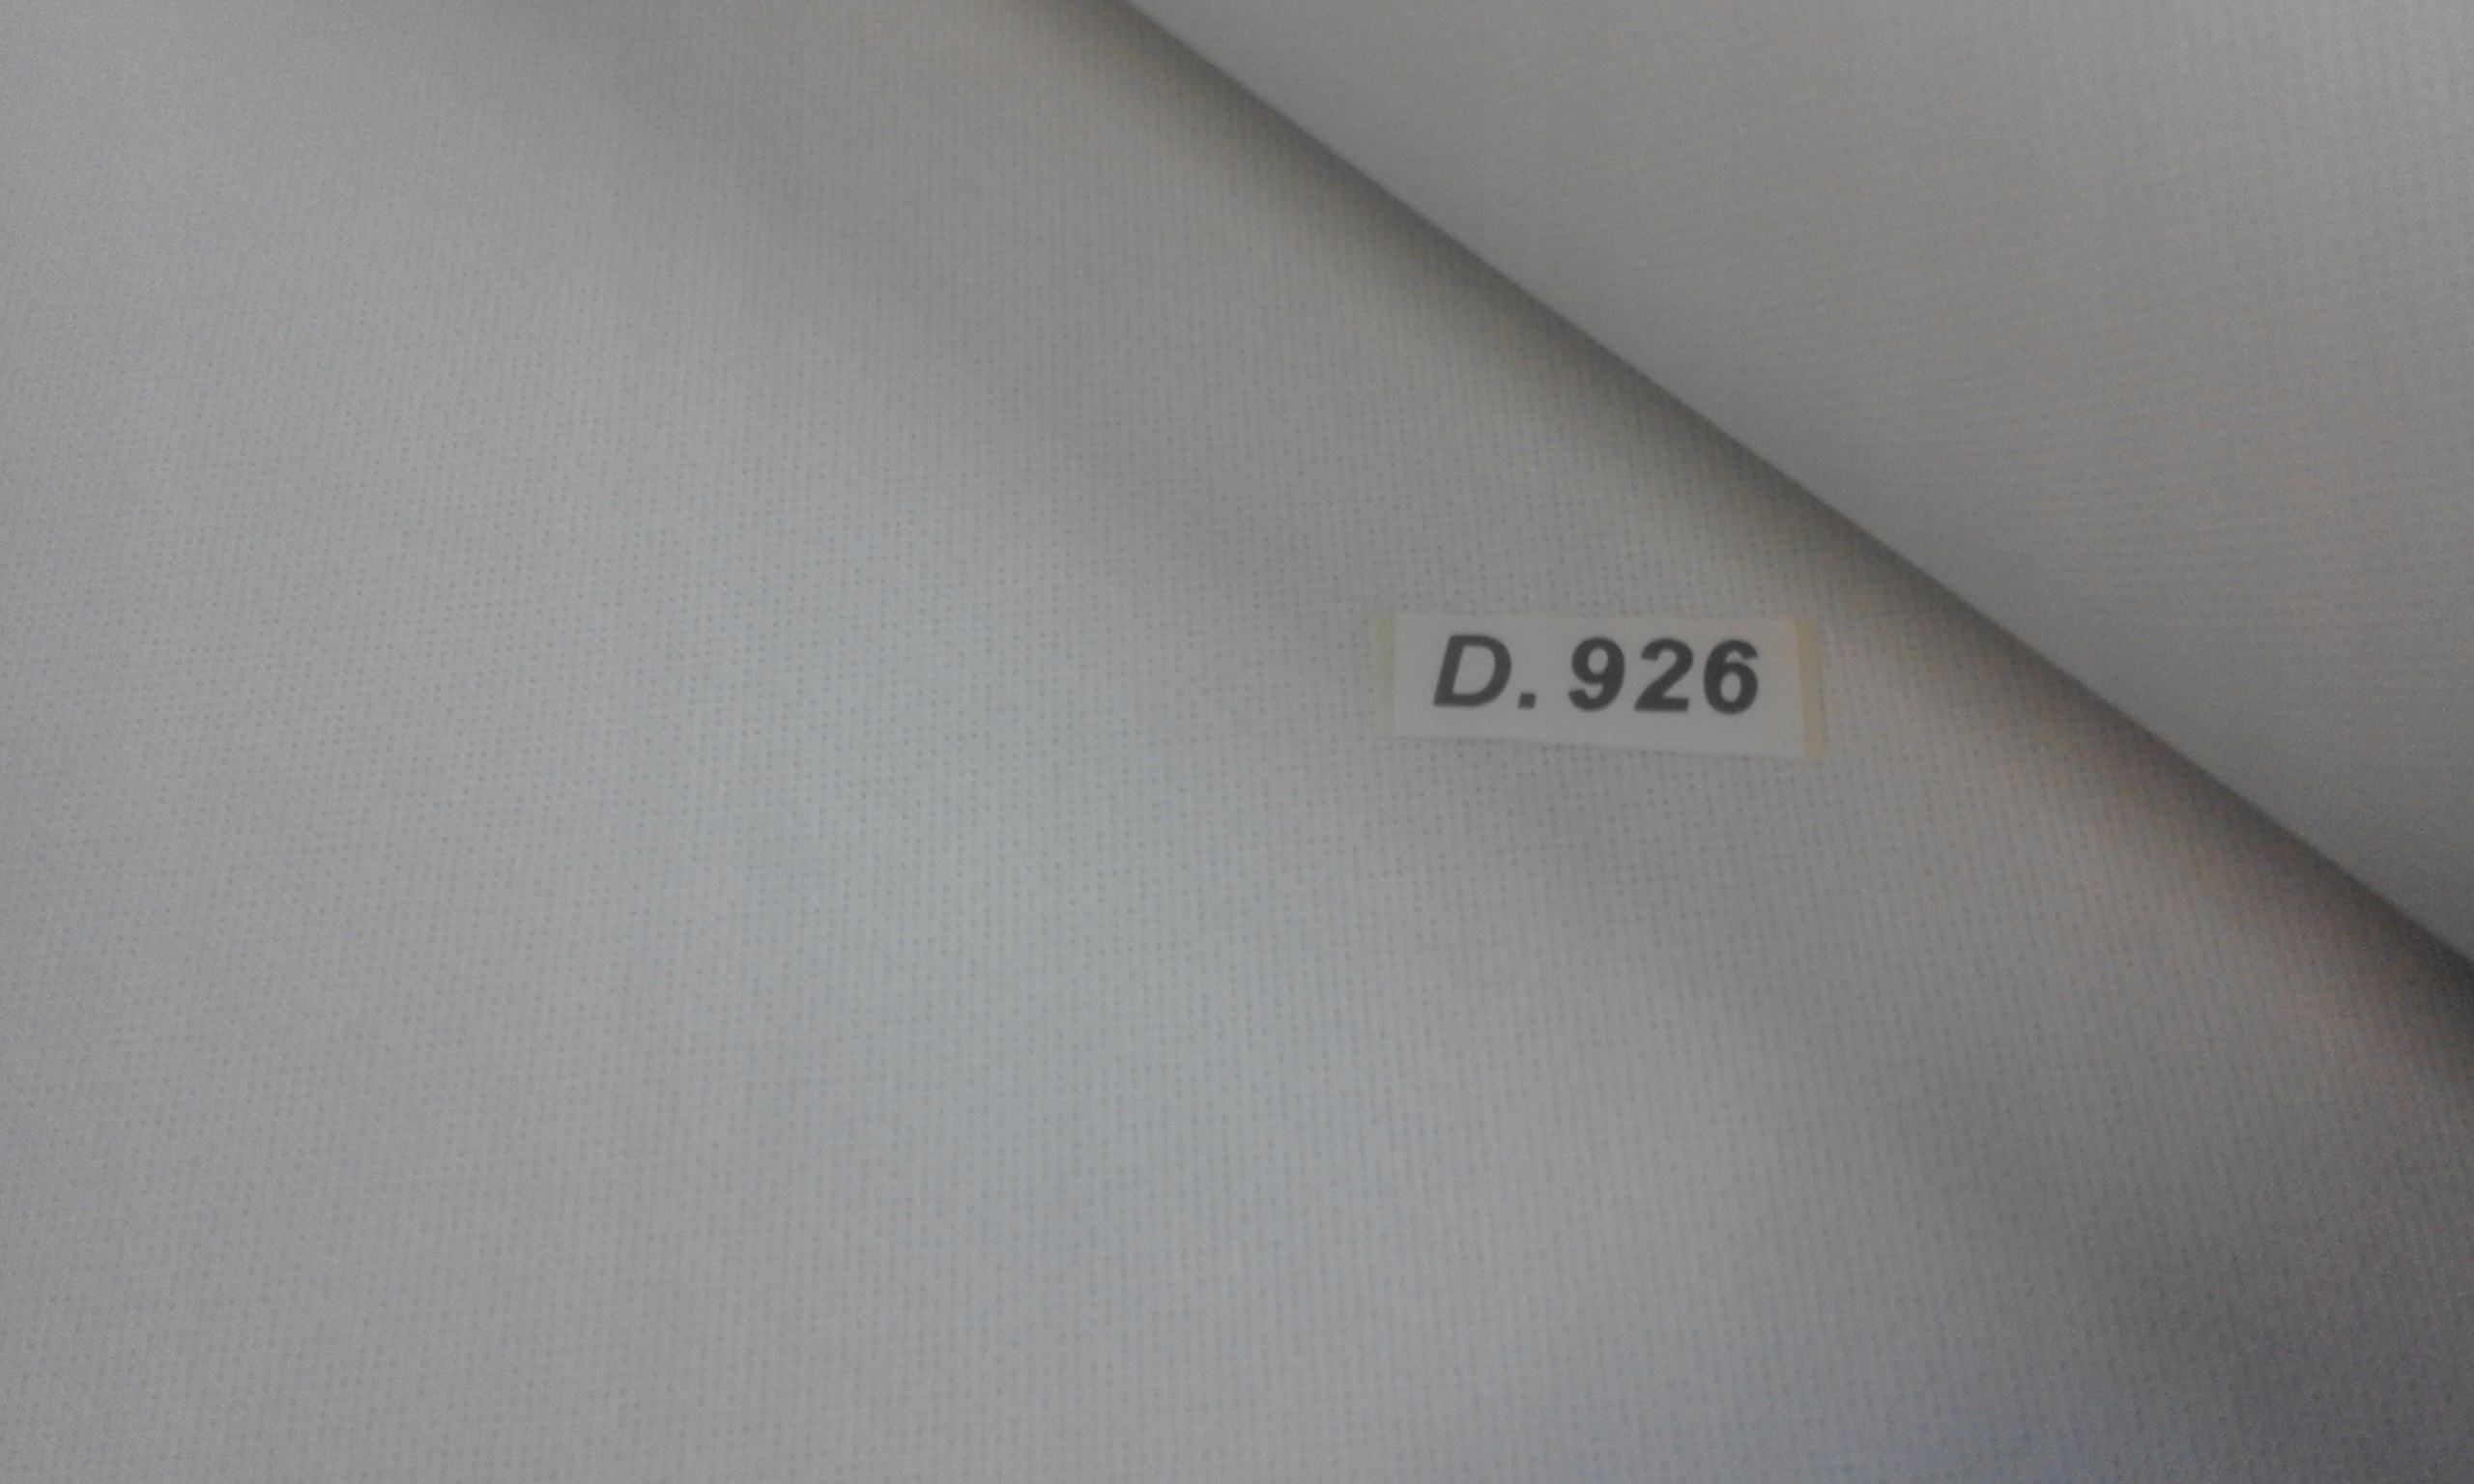 Sztywni do torebek k.biały s.0.90 m za 2 m D.926